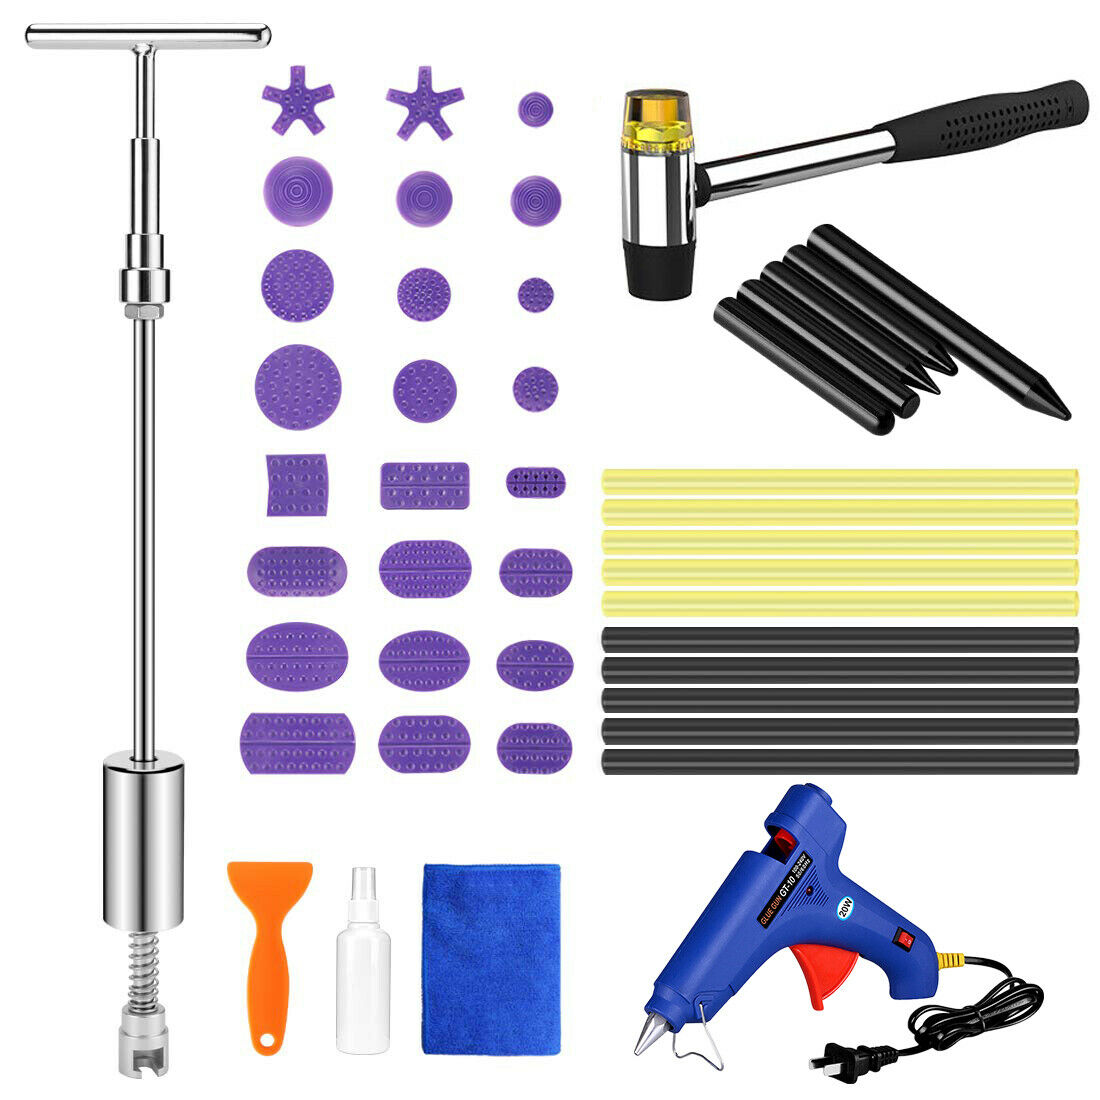 Car Dent Remover Tool Repair Tools Slide Hammer Puller Paintless Removal Tools